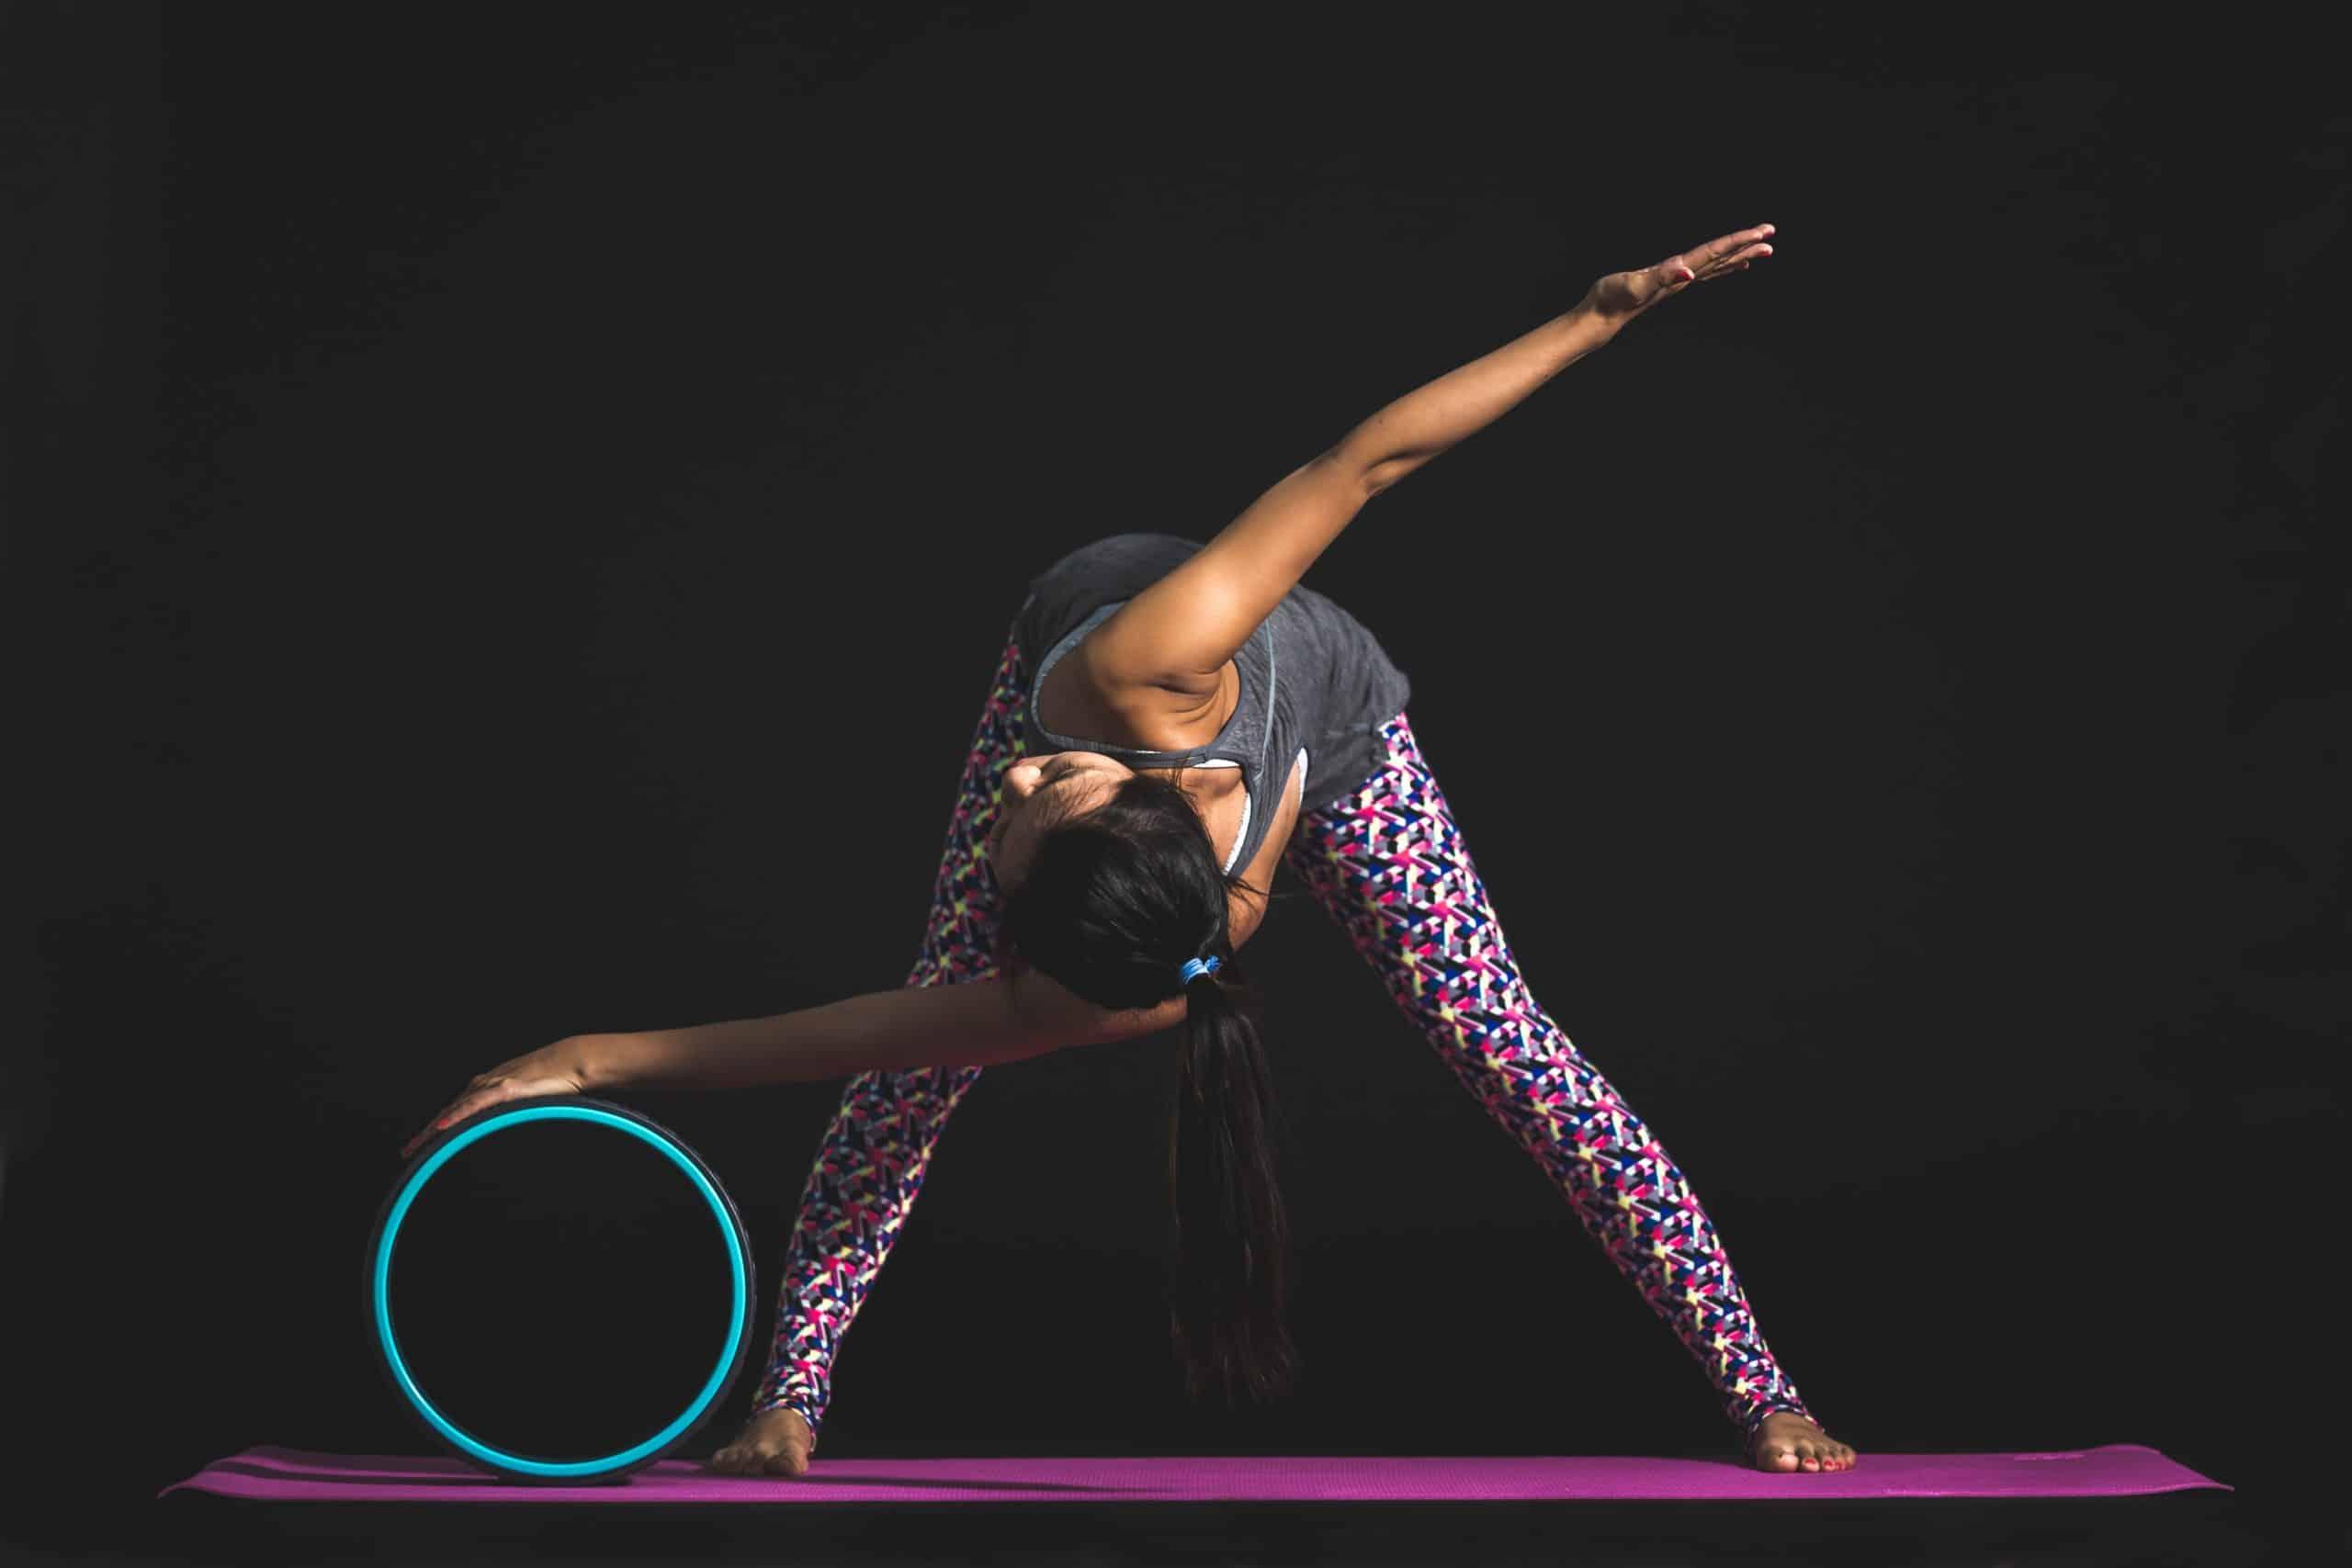 The Cute Yoga Pants Of 2019